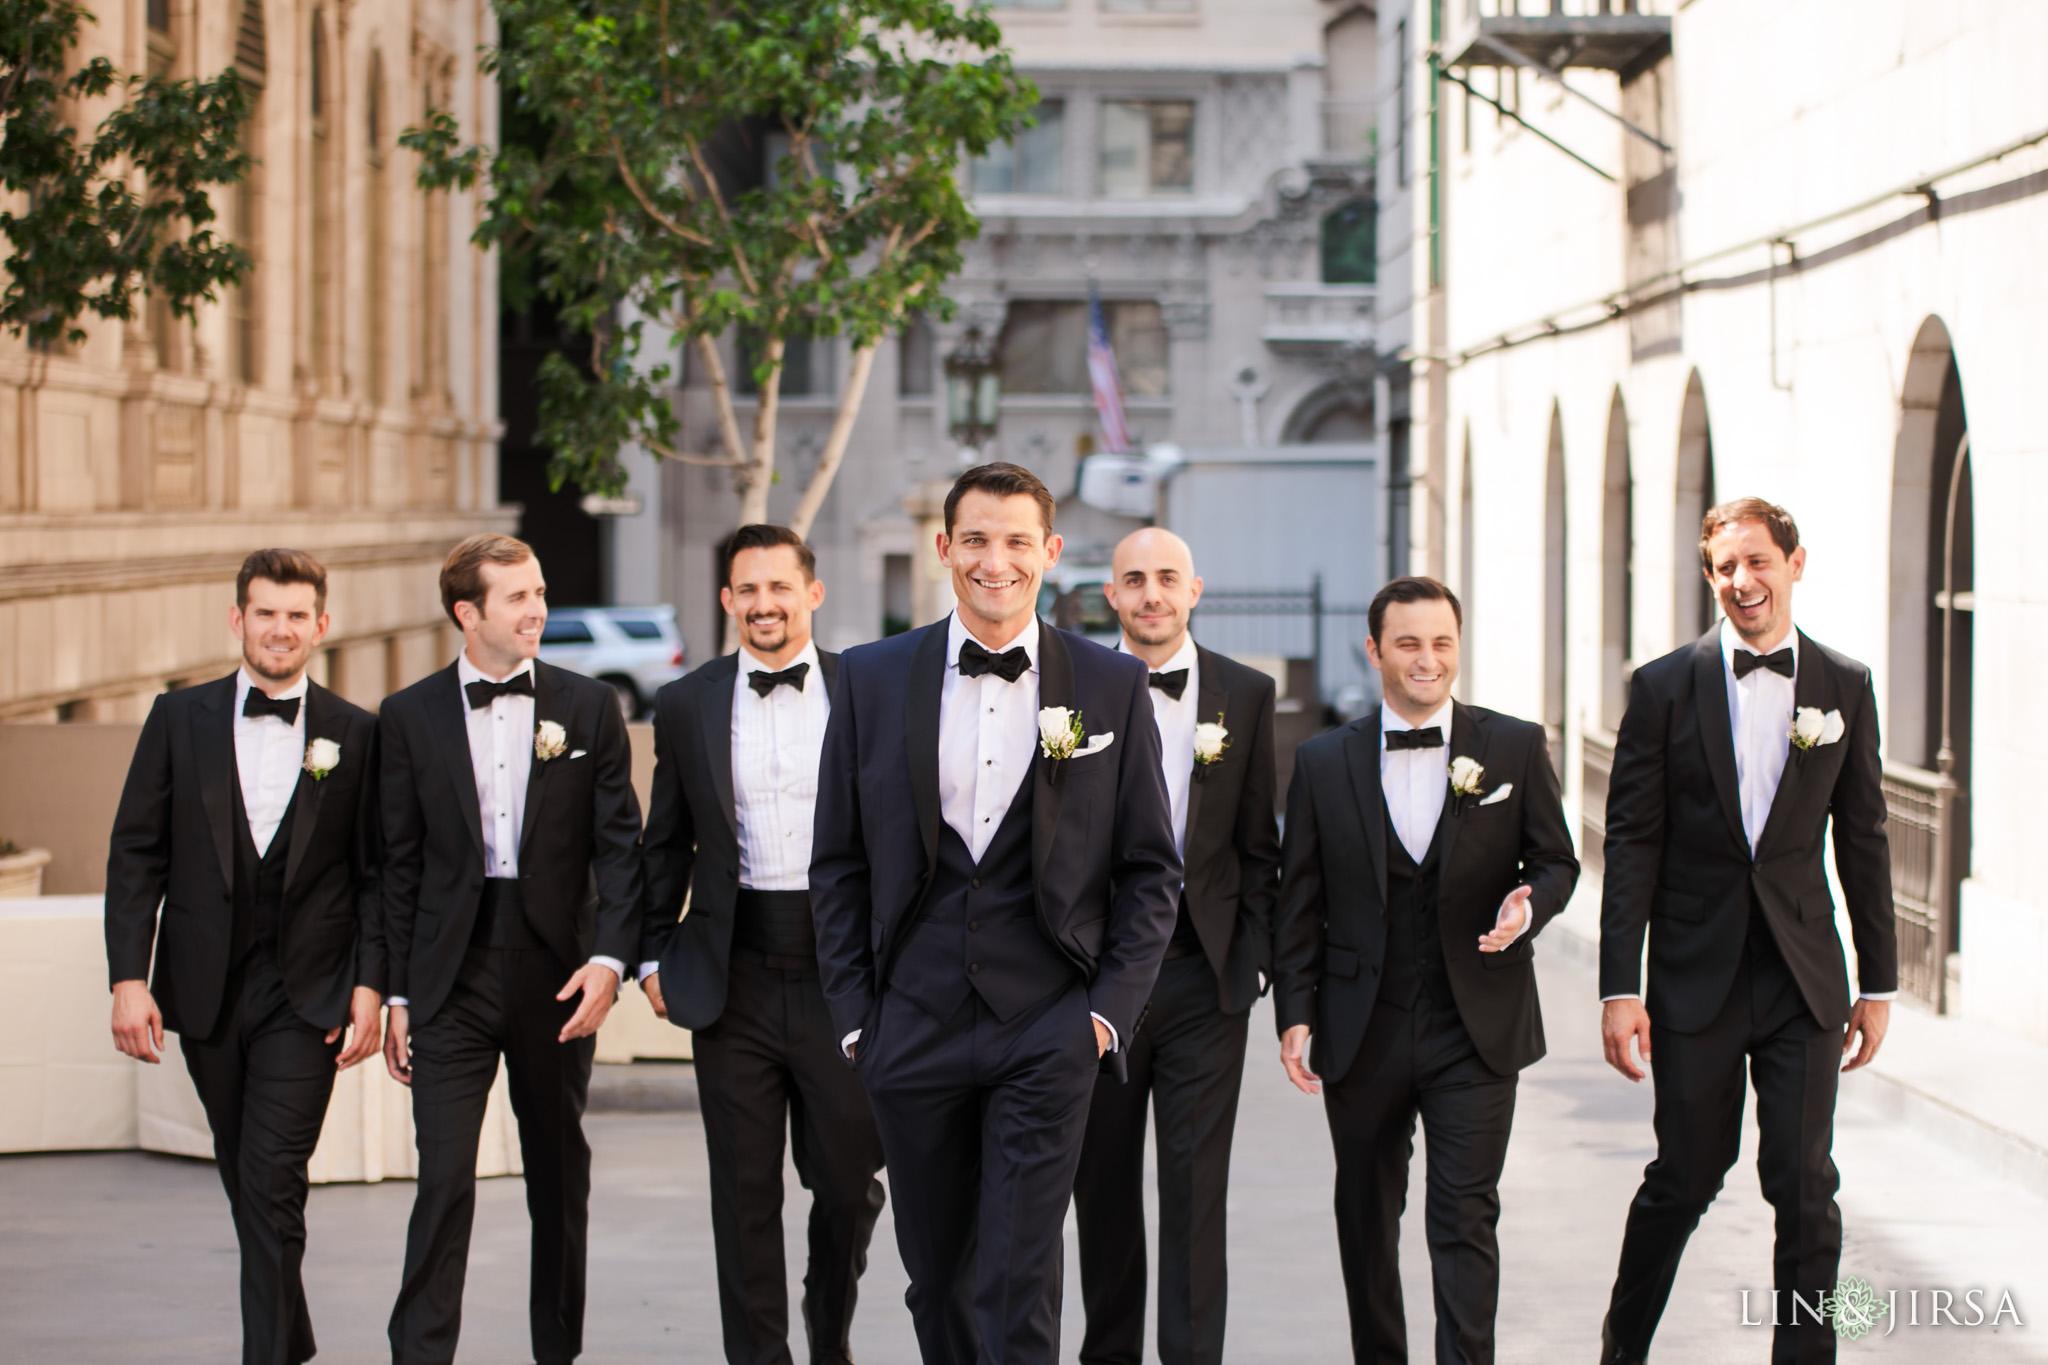 008 millennium biltmore hotel los angeles wedding photography